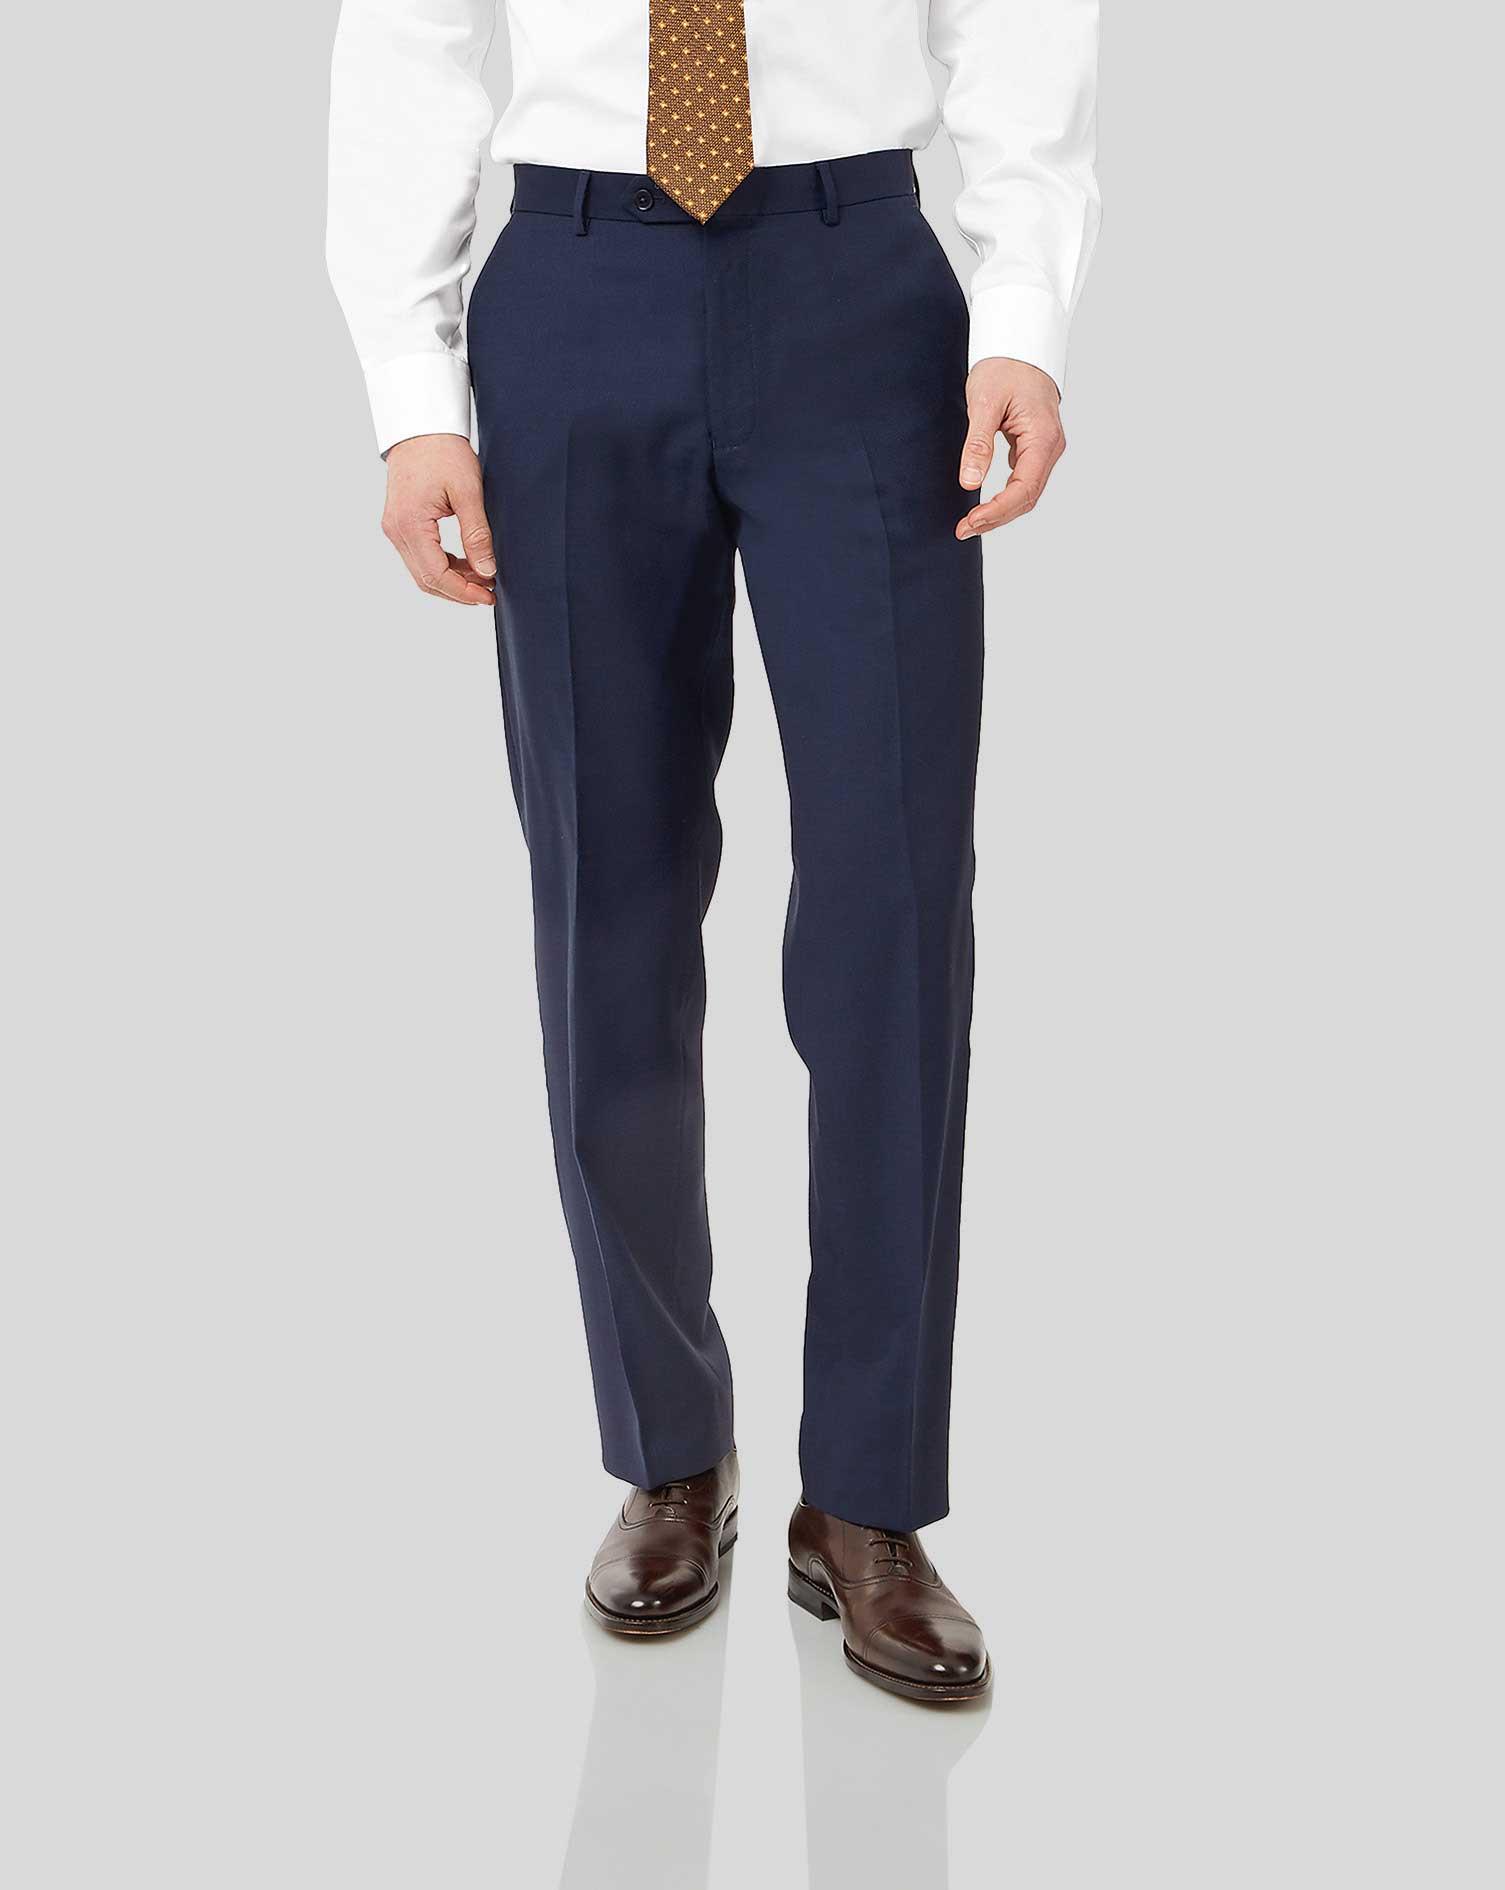 Wool Ink Blue Classic Fit Birdseye Travel Suit Trousers